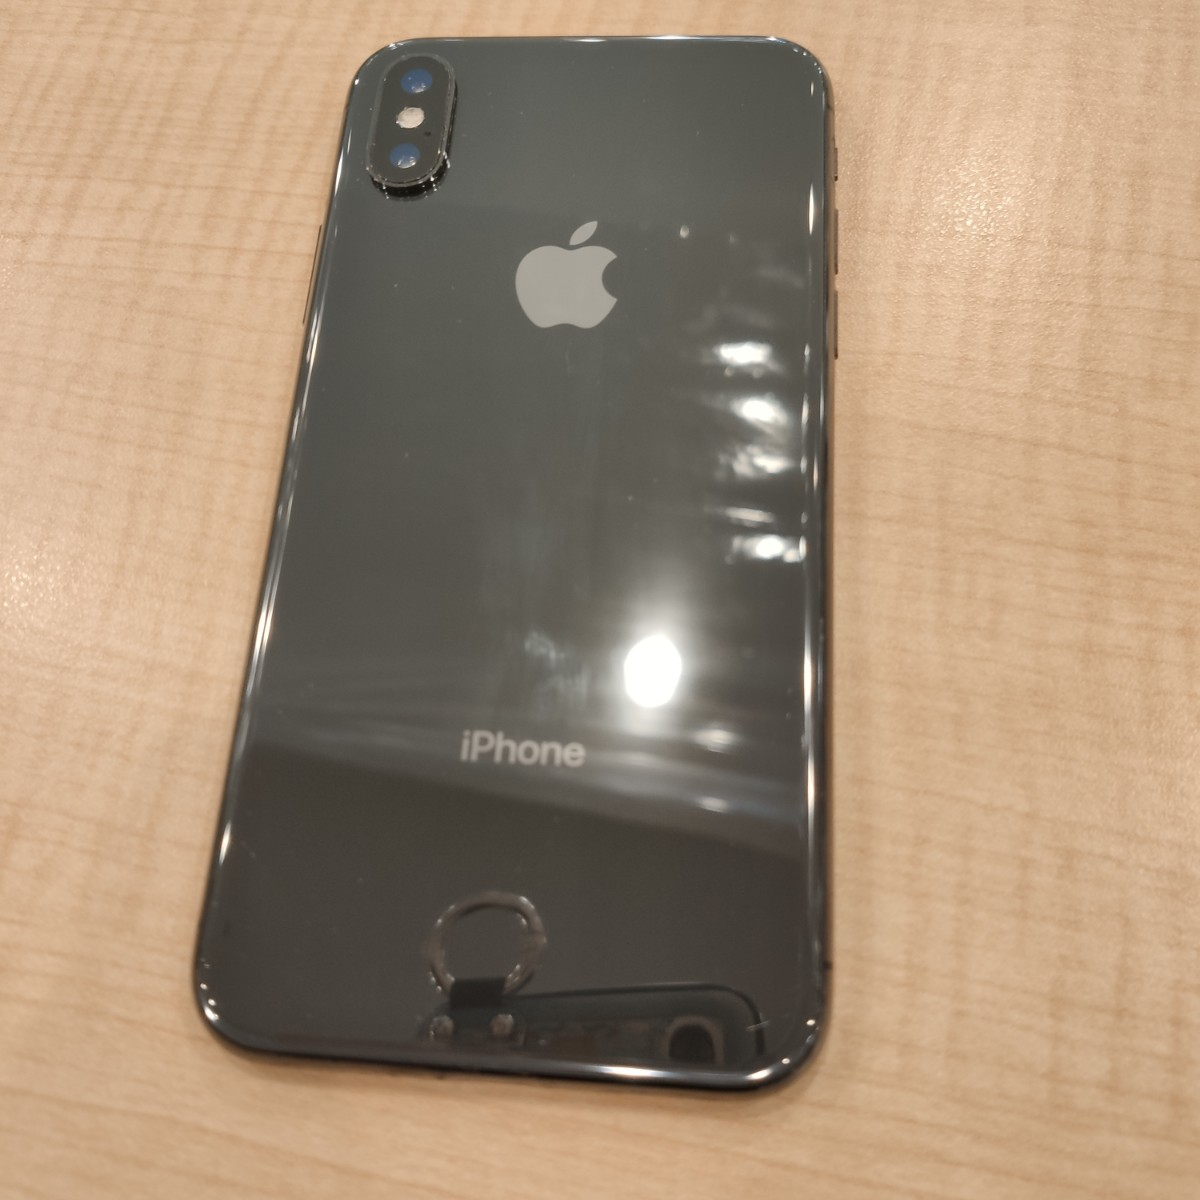 iPhoneX 64GB スペースグレーau〇 中古ジャンク